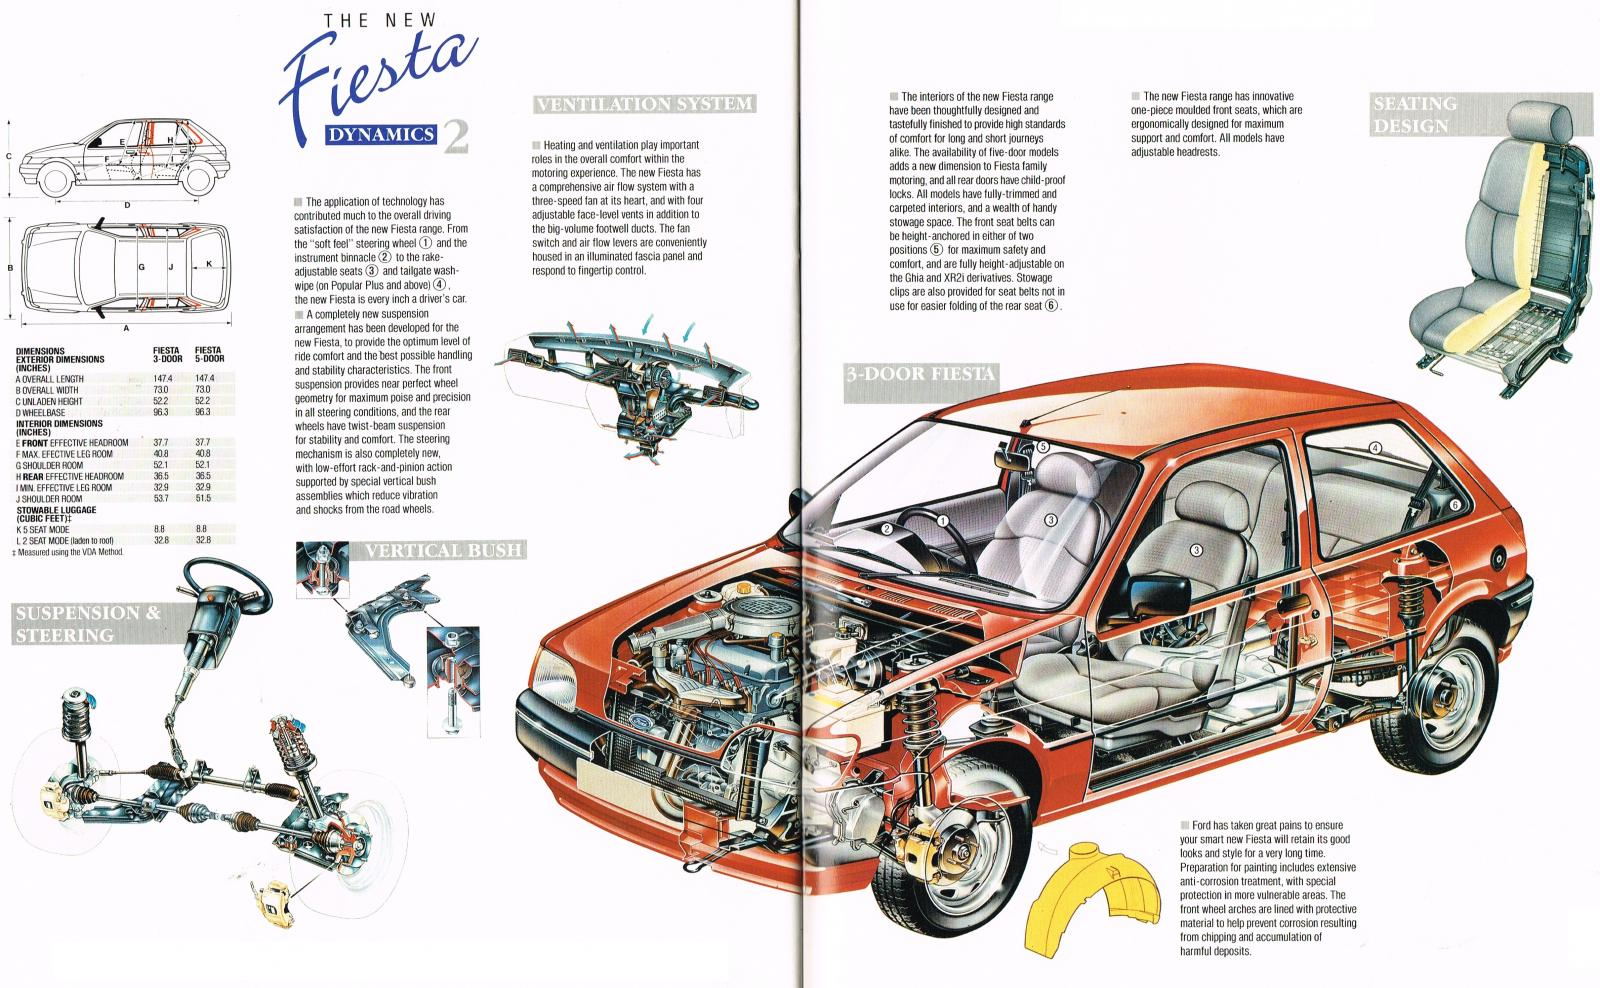 Ford Fiesta Mk3 launch brochure 1989 36-37.jpg